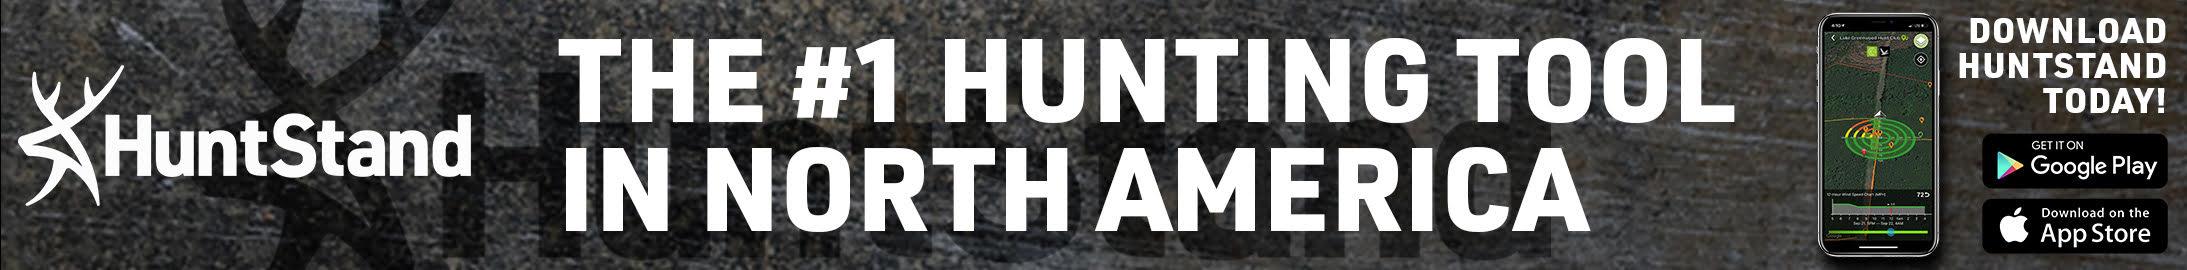 HuntStand Hunting App